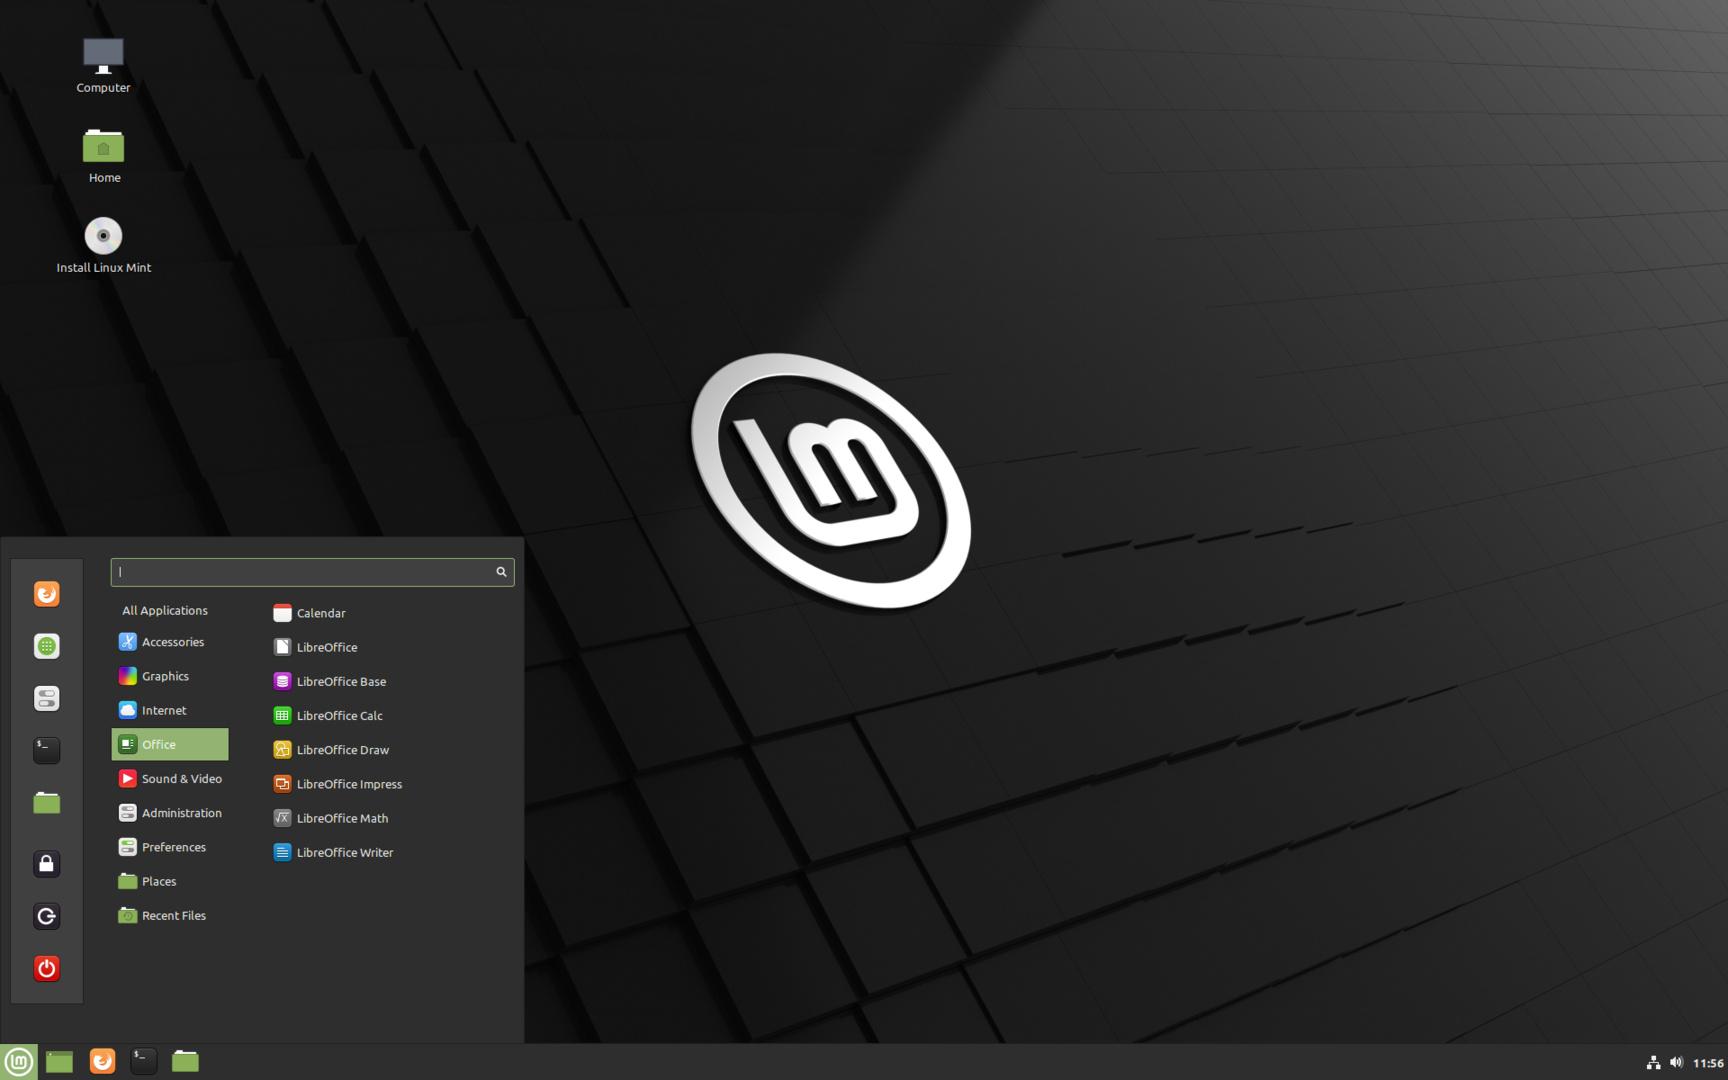 Linux Mint 20 Cinnamon-Edition